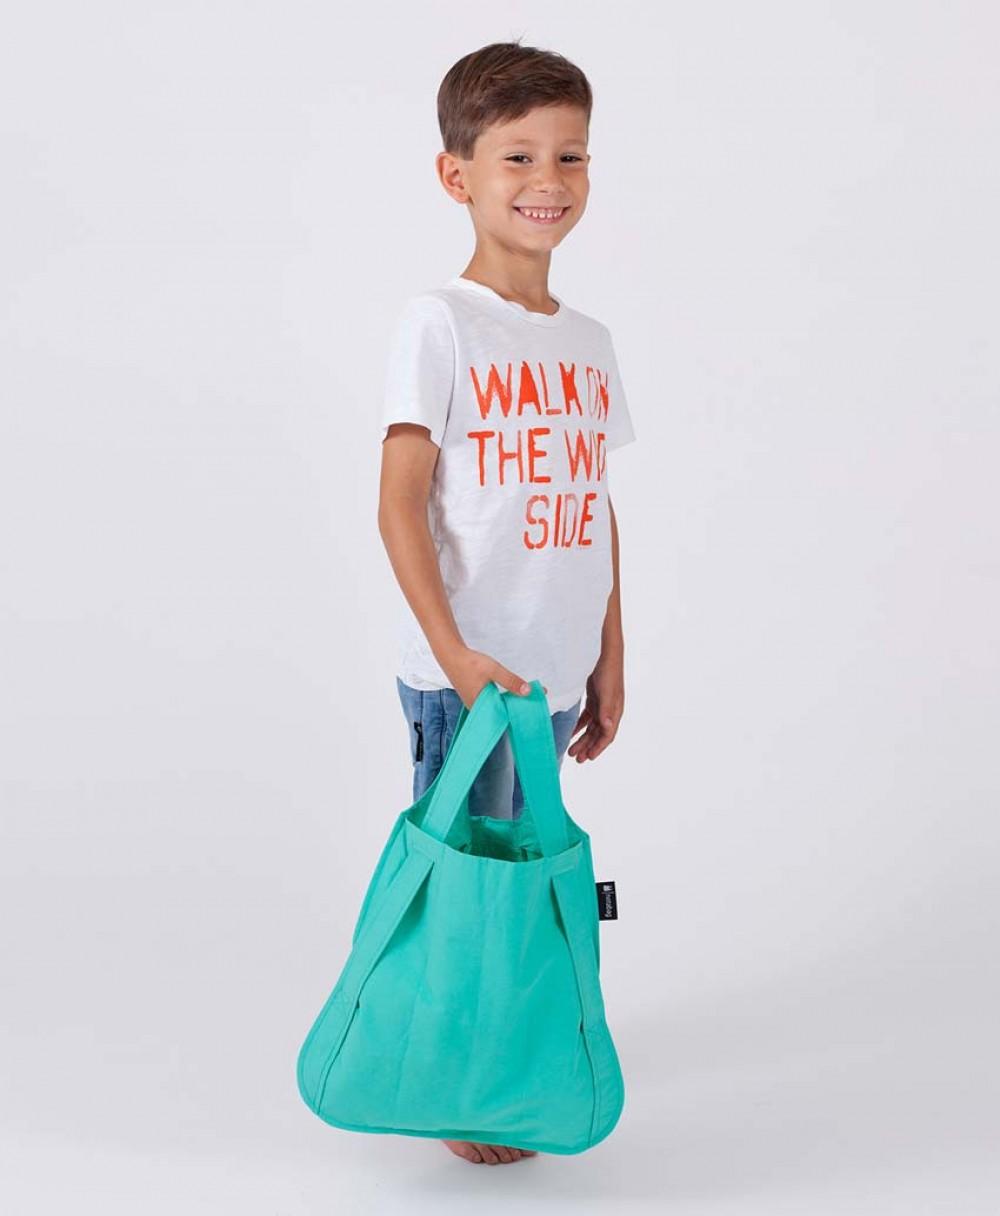 541b348fa7c Notabag KIDS Παιδική Τσάντα χειρός / Σακίδιο πλάτης - Κόκκινο ...